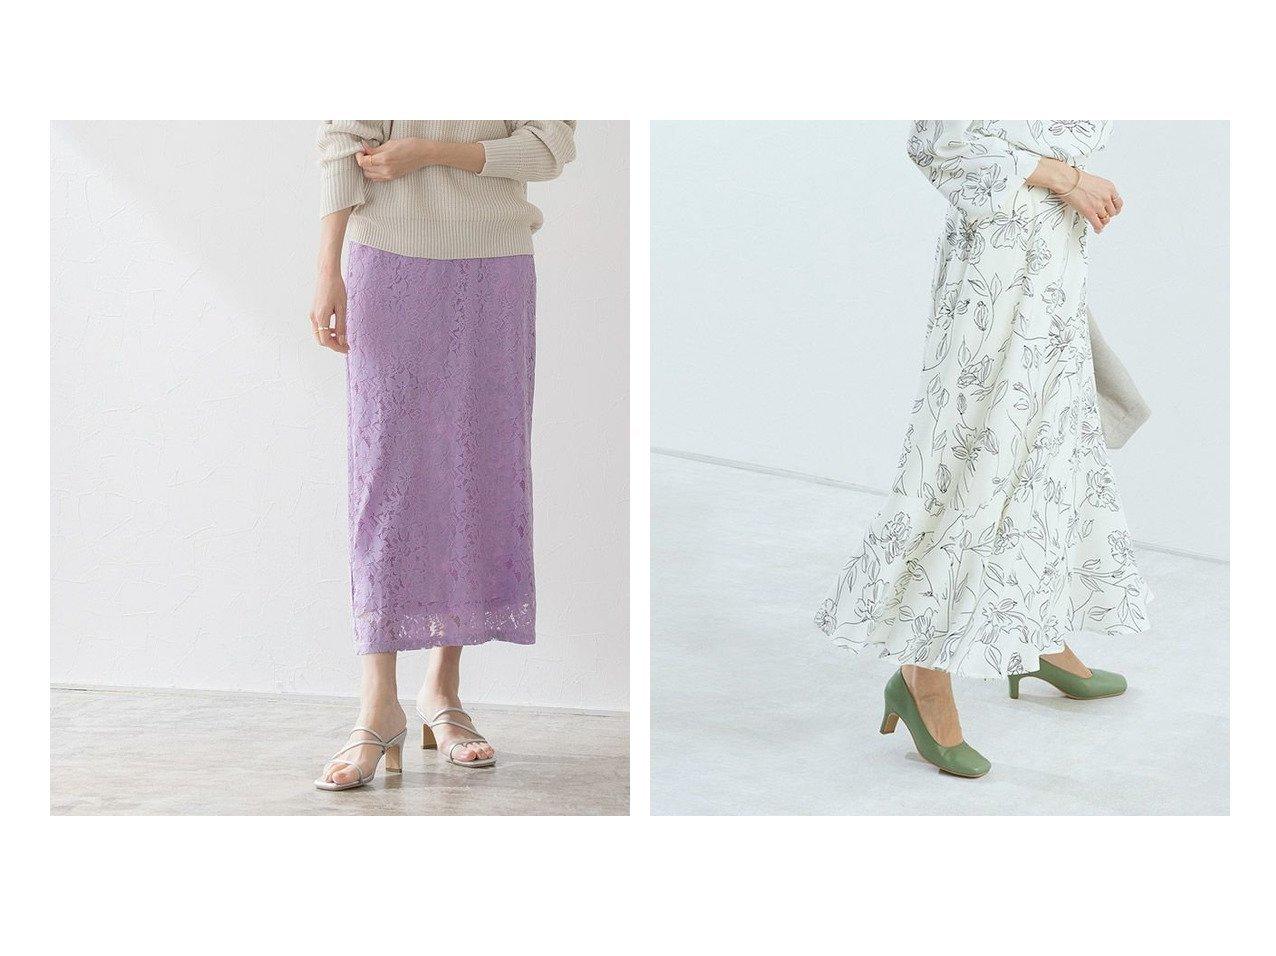 【Pierrot/ピエロ】のレースタイトロングスカート MD&選べる花柄マーメイドスカート おすすめ!人気!プチプライスで上品なファッションアイテムの通販 おすすめで人気の流行・トレンド、ファッションの通販商品 メンズファッション・キッズファッション・インテリア・家具・レディースファッション・服の通販 founy(ファニー) https://founy.com/ ファッション Fashion レディースファッション WOMEN スカート Skirt ロングスカート Long Skirt ジョーゼット プチプライス・低価格 Affordable マーメイド スリット フェミニン ランダム レース |ID:crp329100000020714